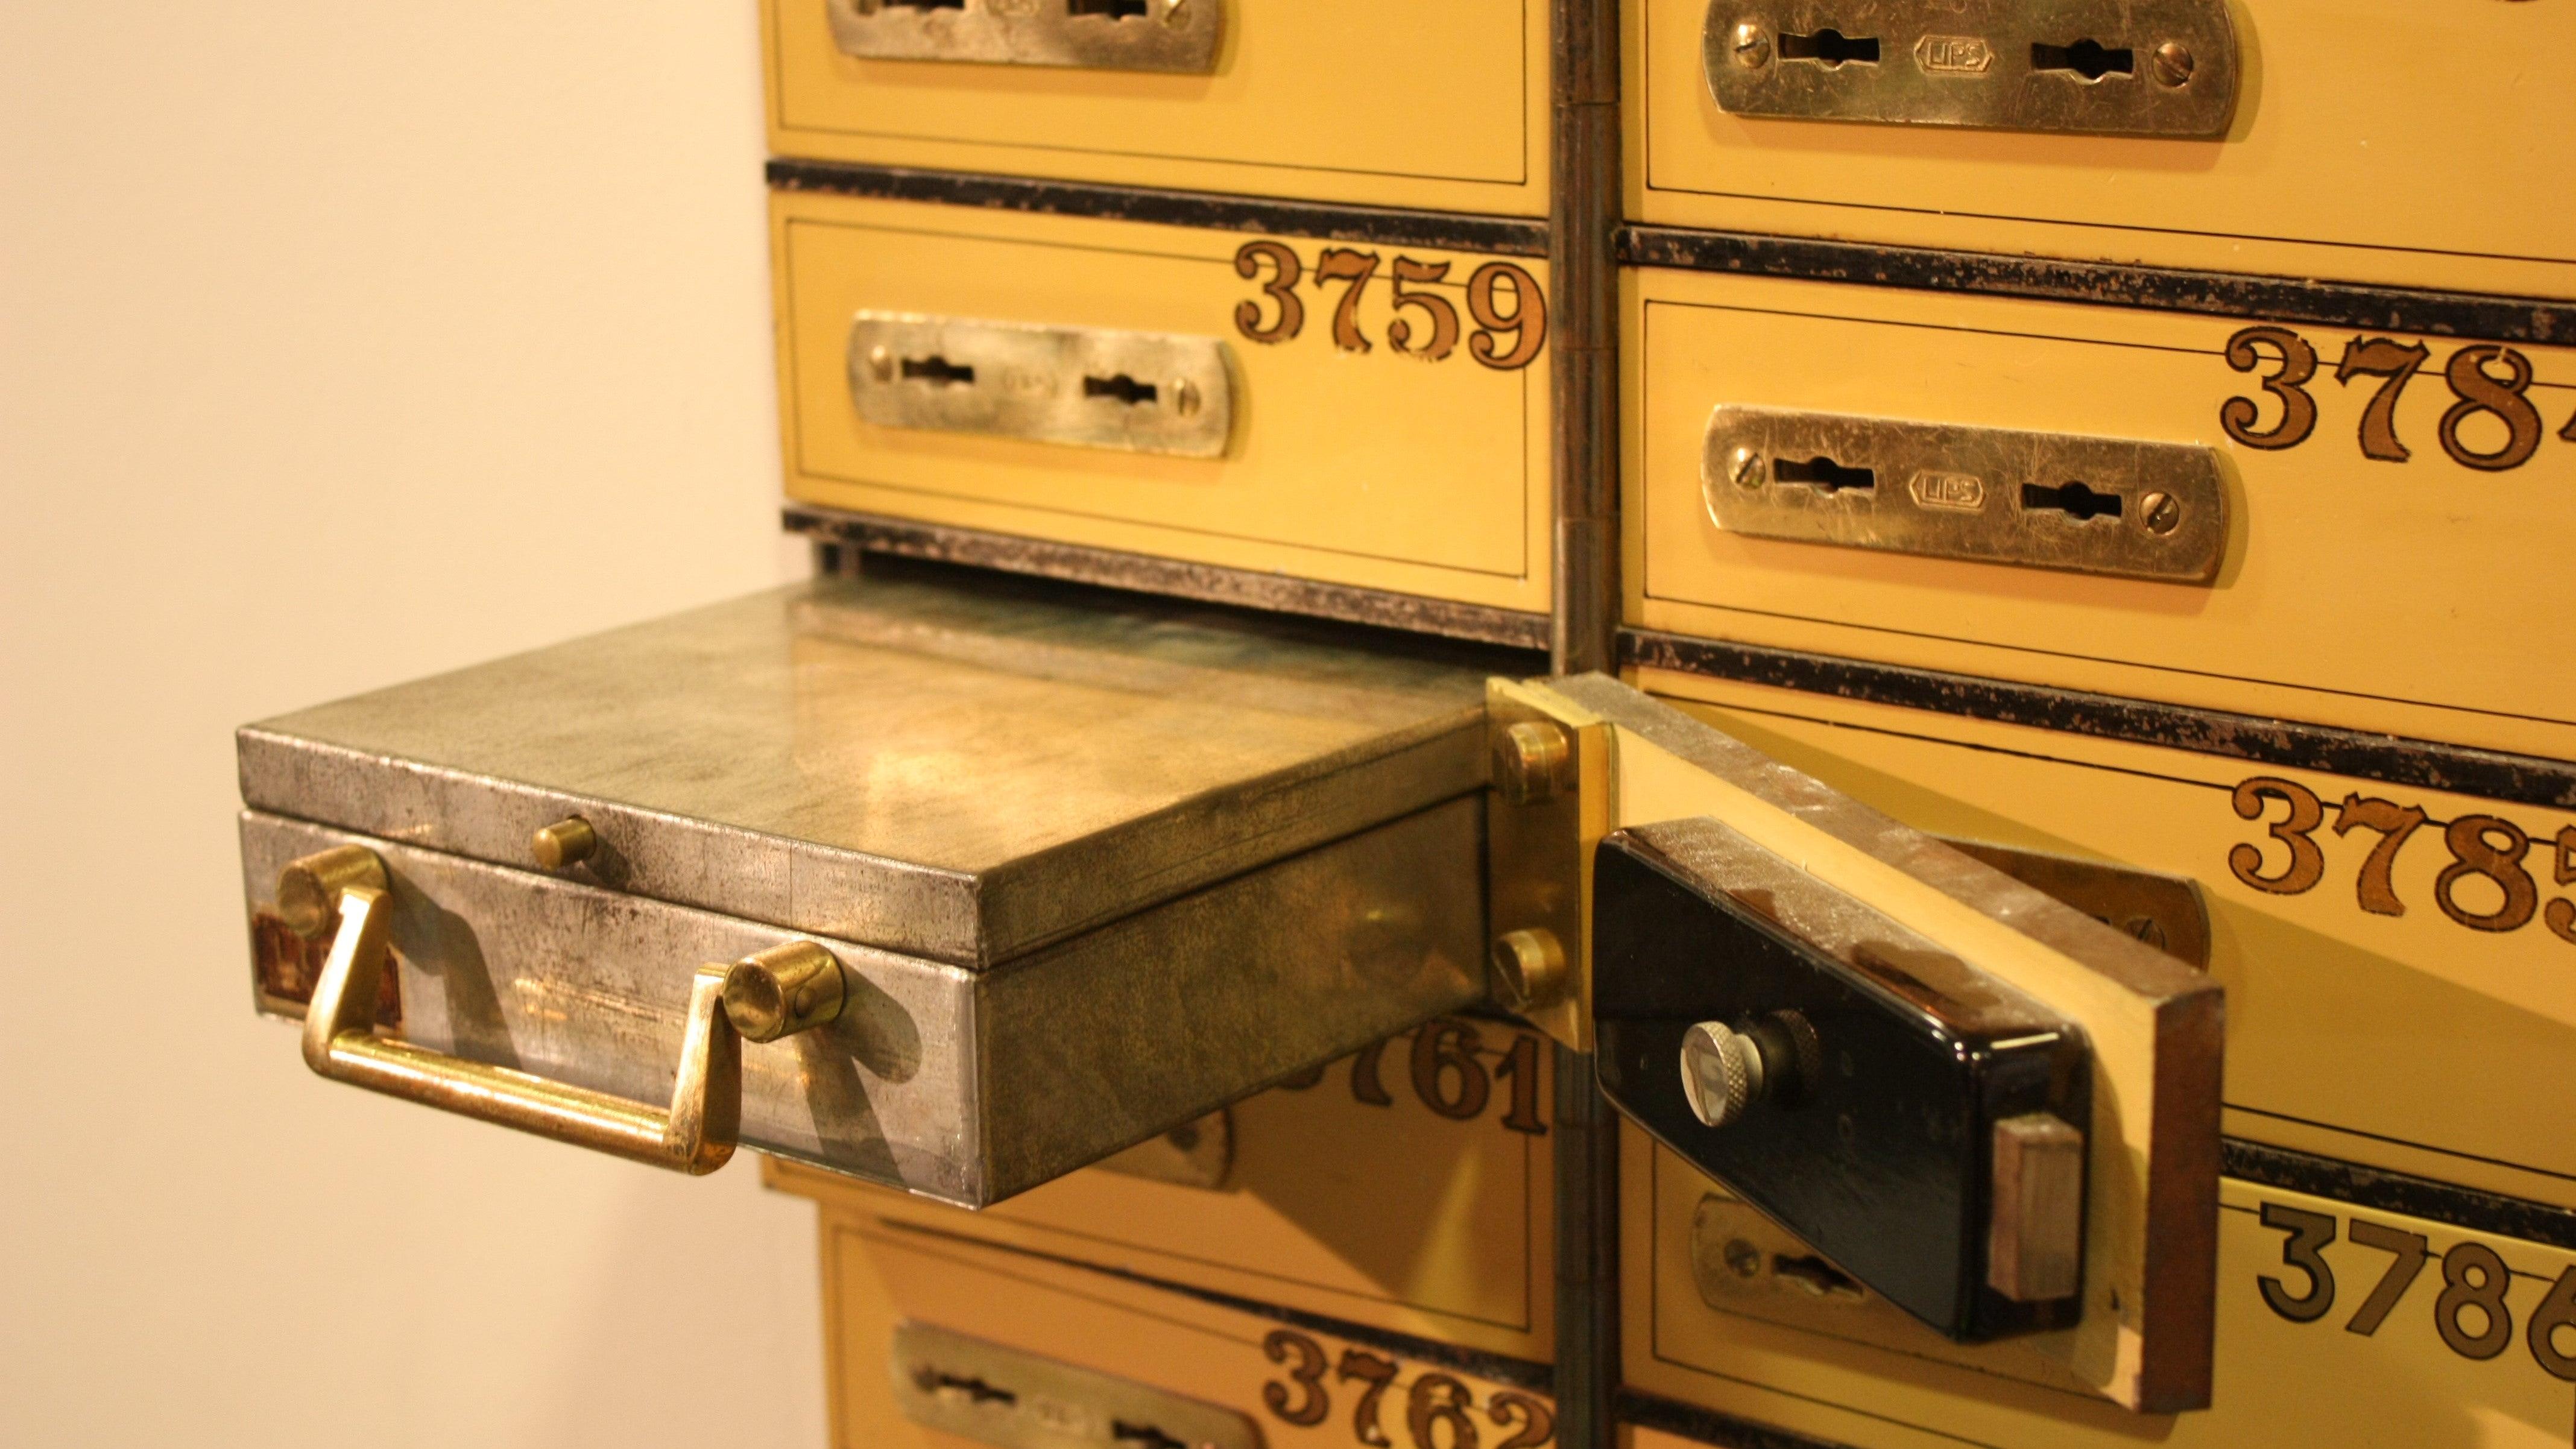 It's Time To Find A Safe Deposit Box Alternative